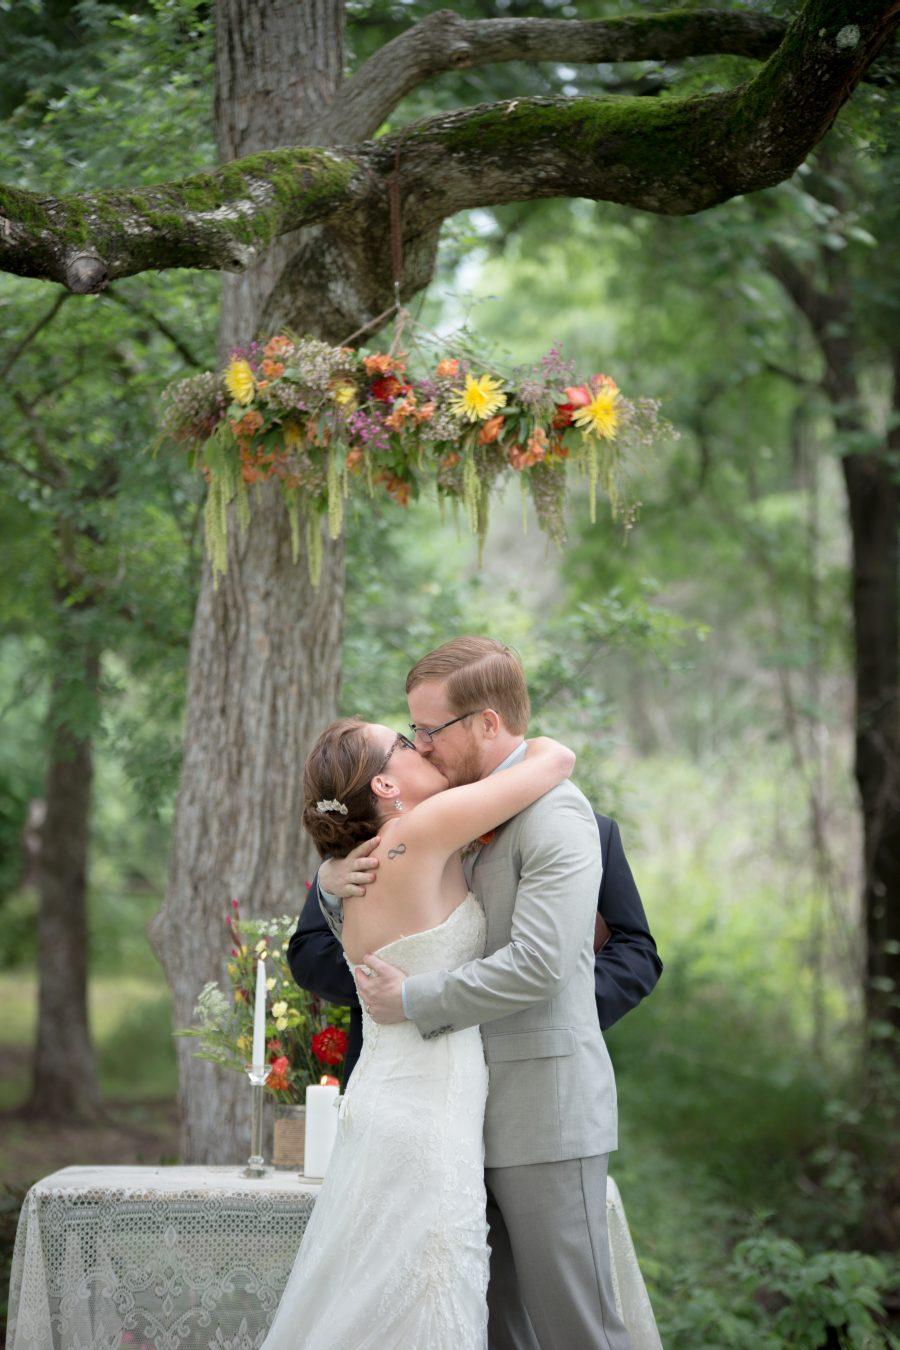 HighDot-Studios-Wedding-Cedar-Bend-Event-Center -Austin-Kim and Mike (32)